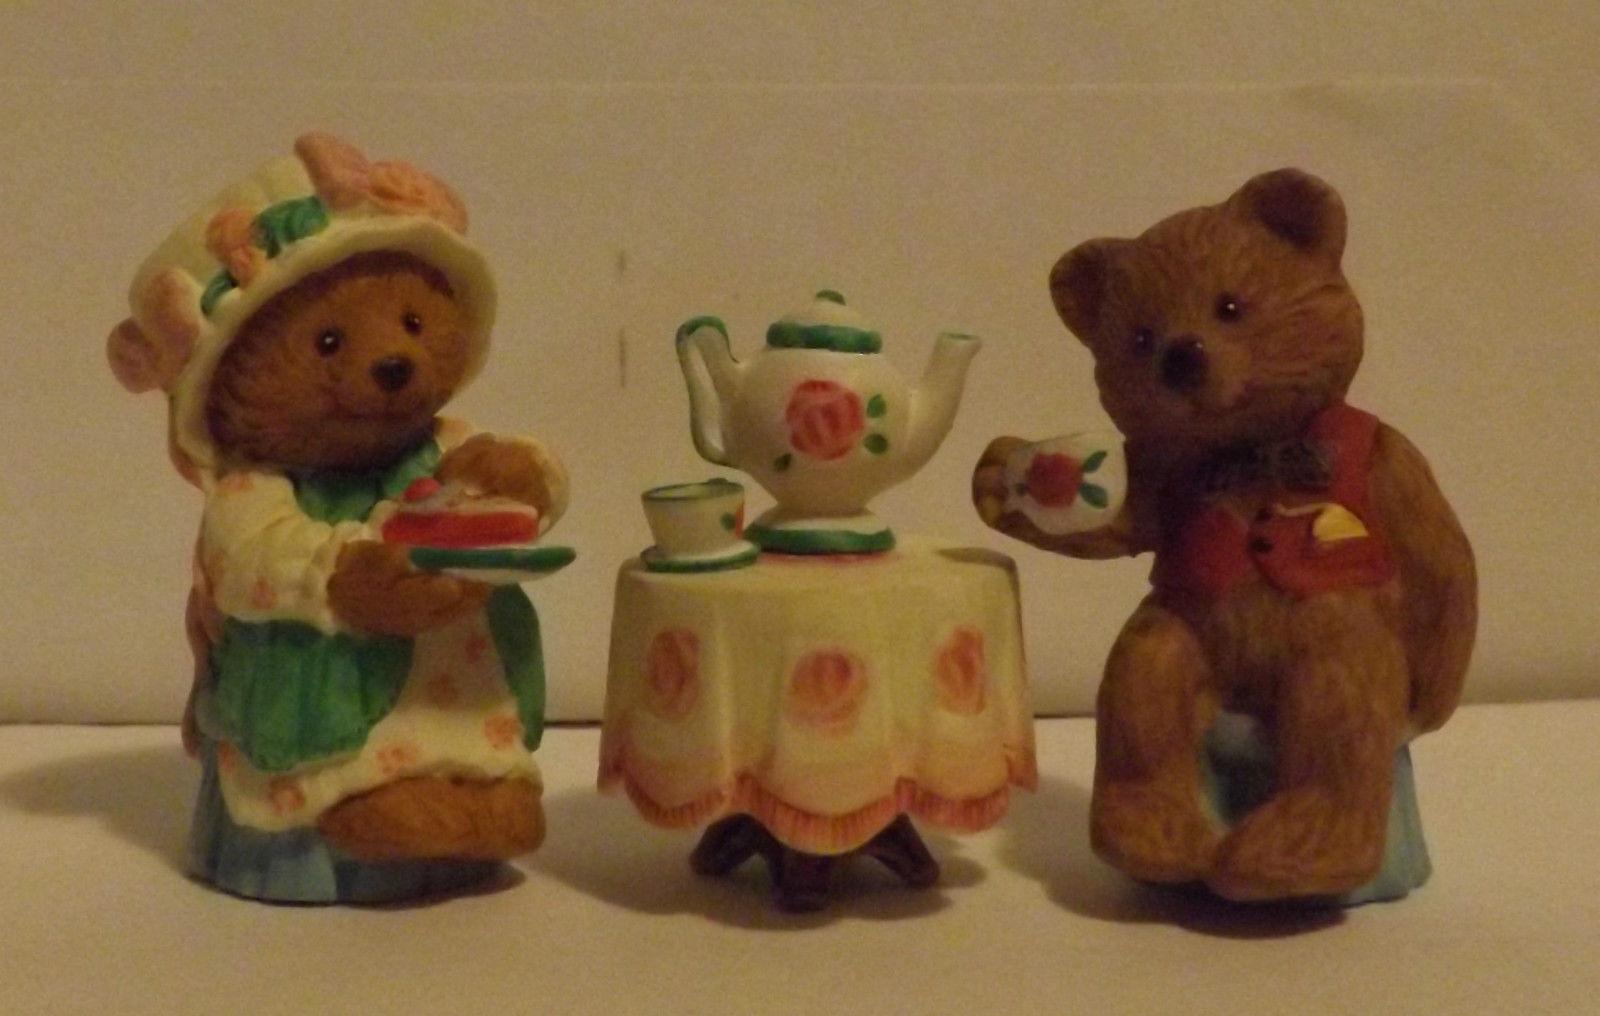 Hallmark Merry Miniatures Tea Time 3-Piece Set 1997